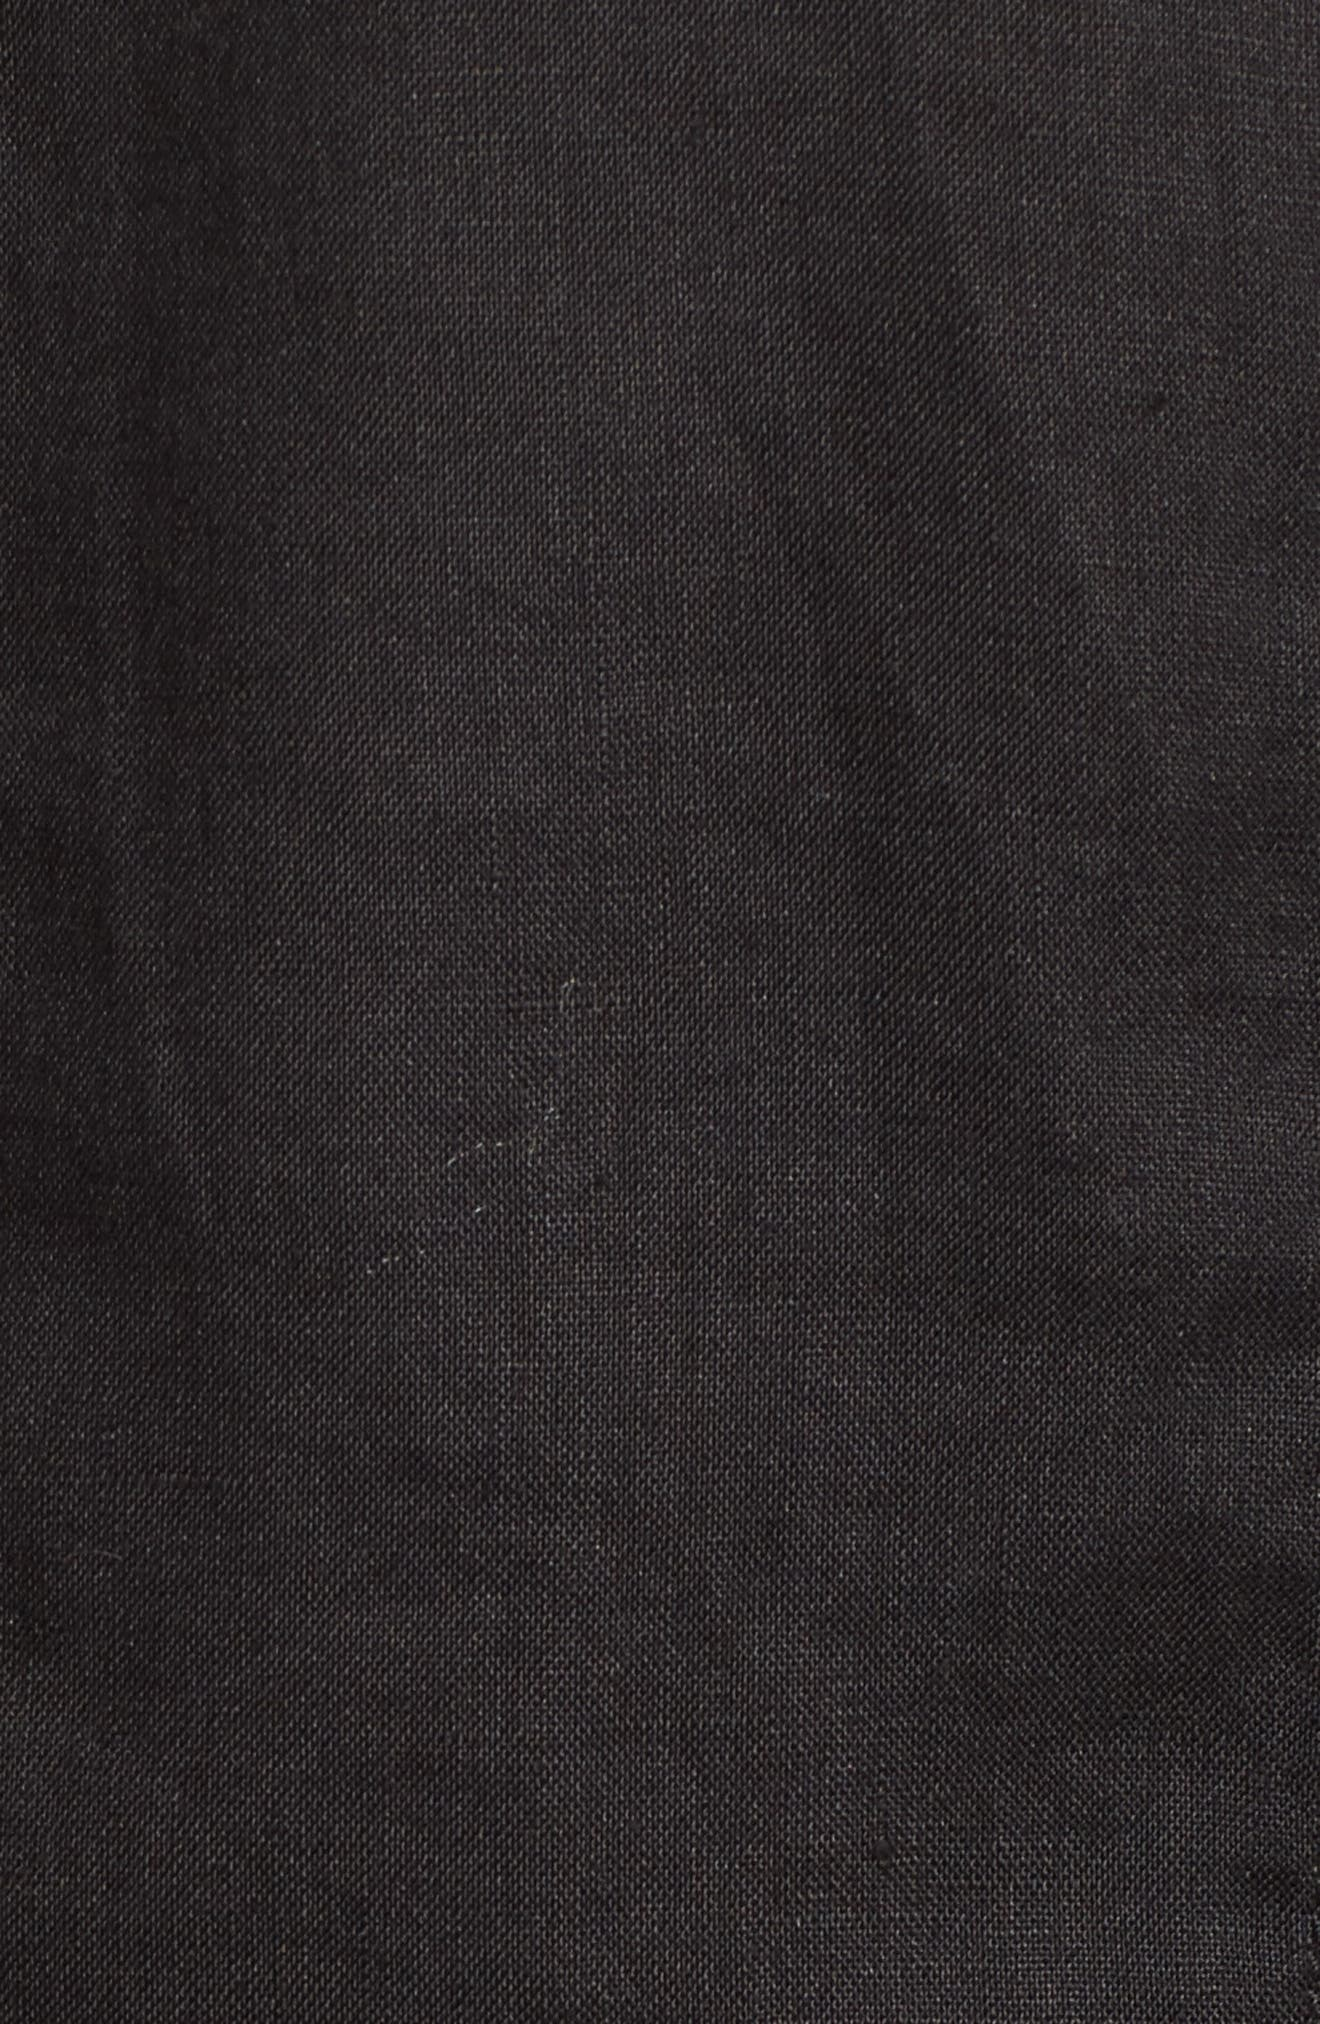 Crop Organic Linen Jacket,                             Alternate thumbnail 6, color,                             001